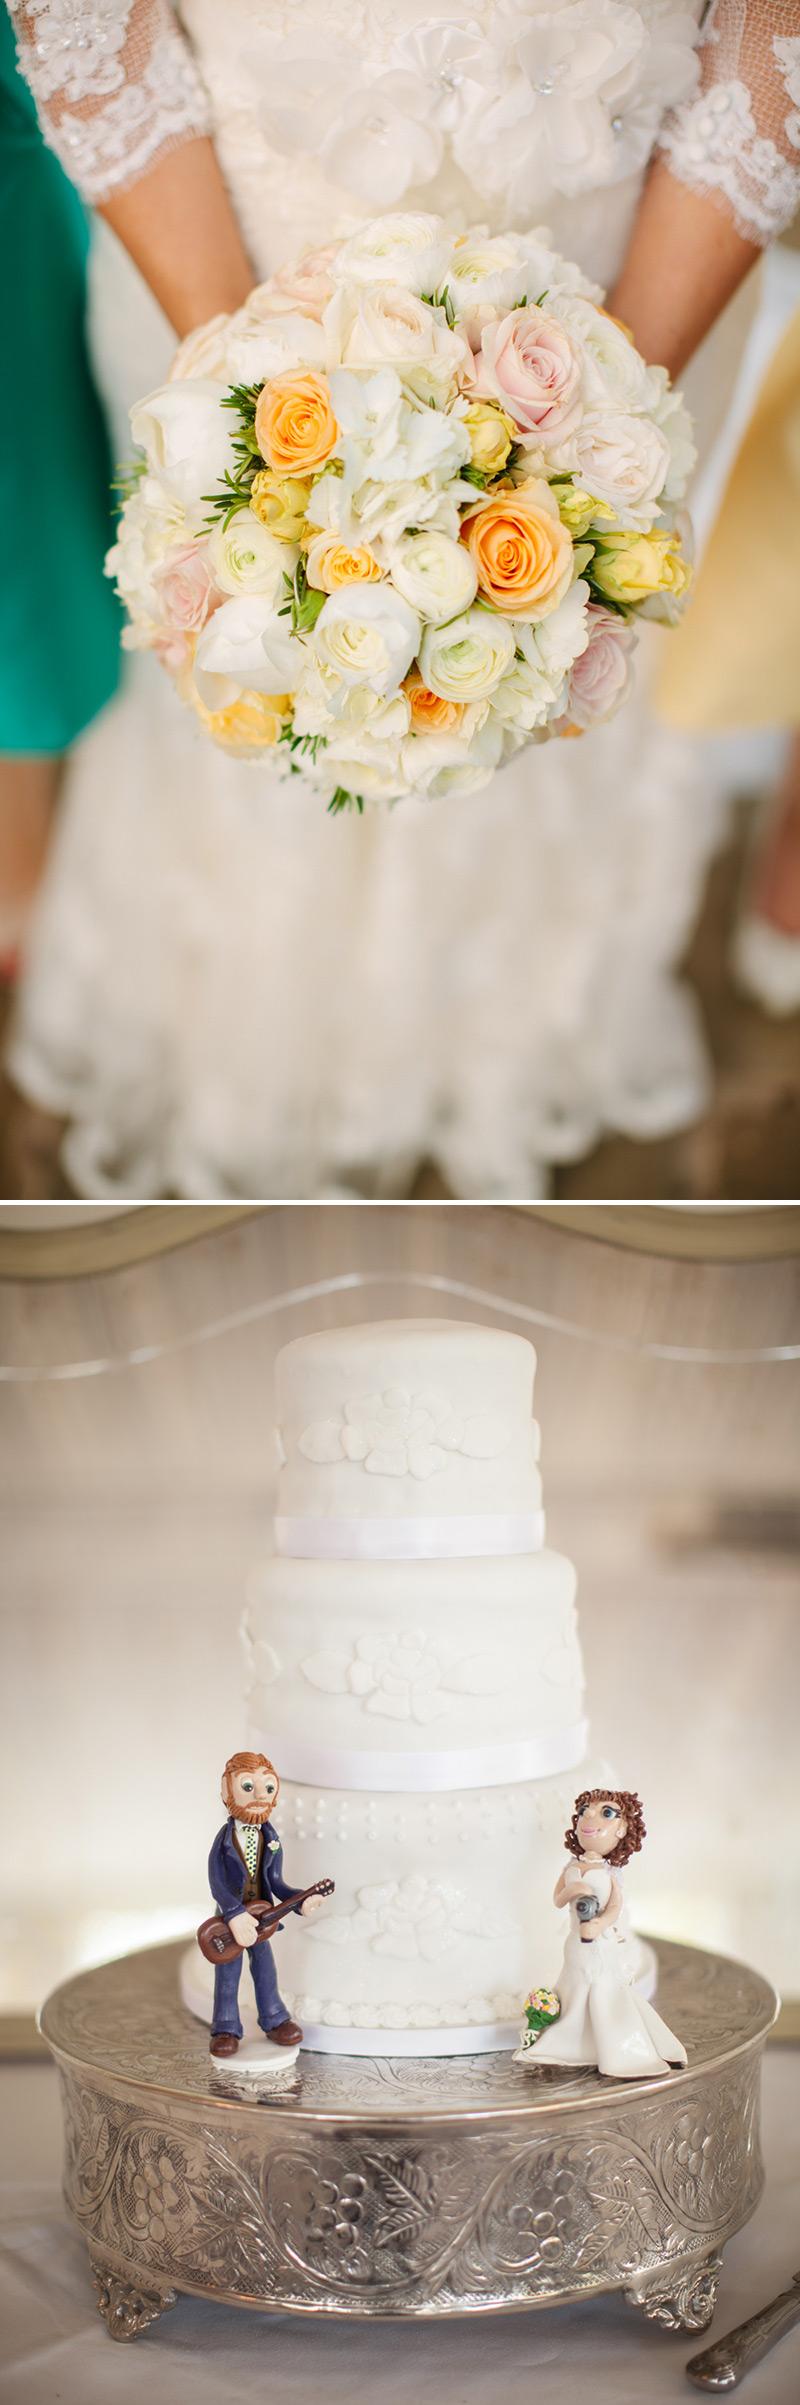 Chloe gillon wedding